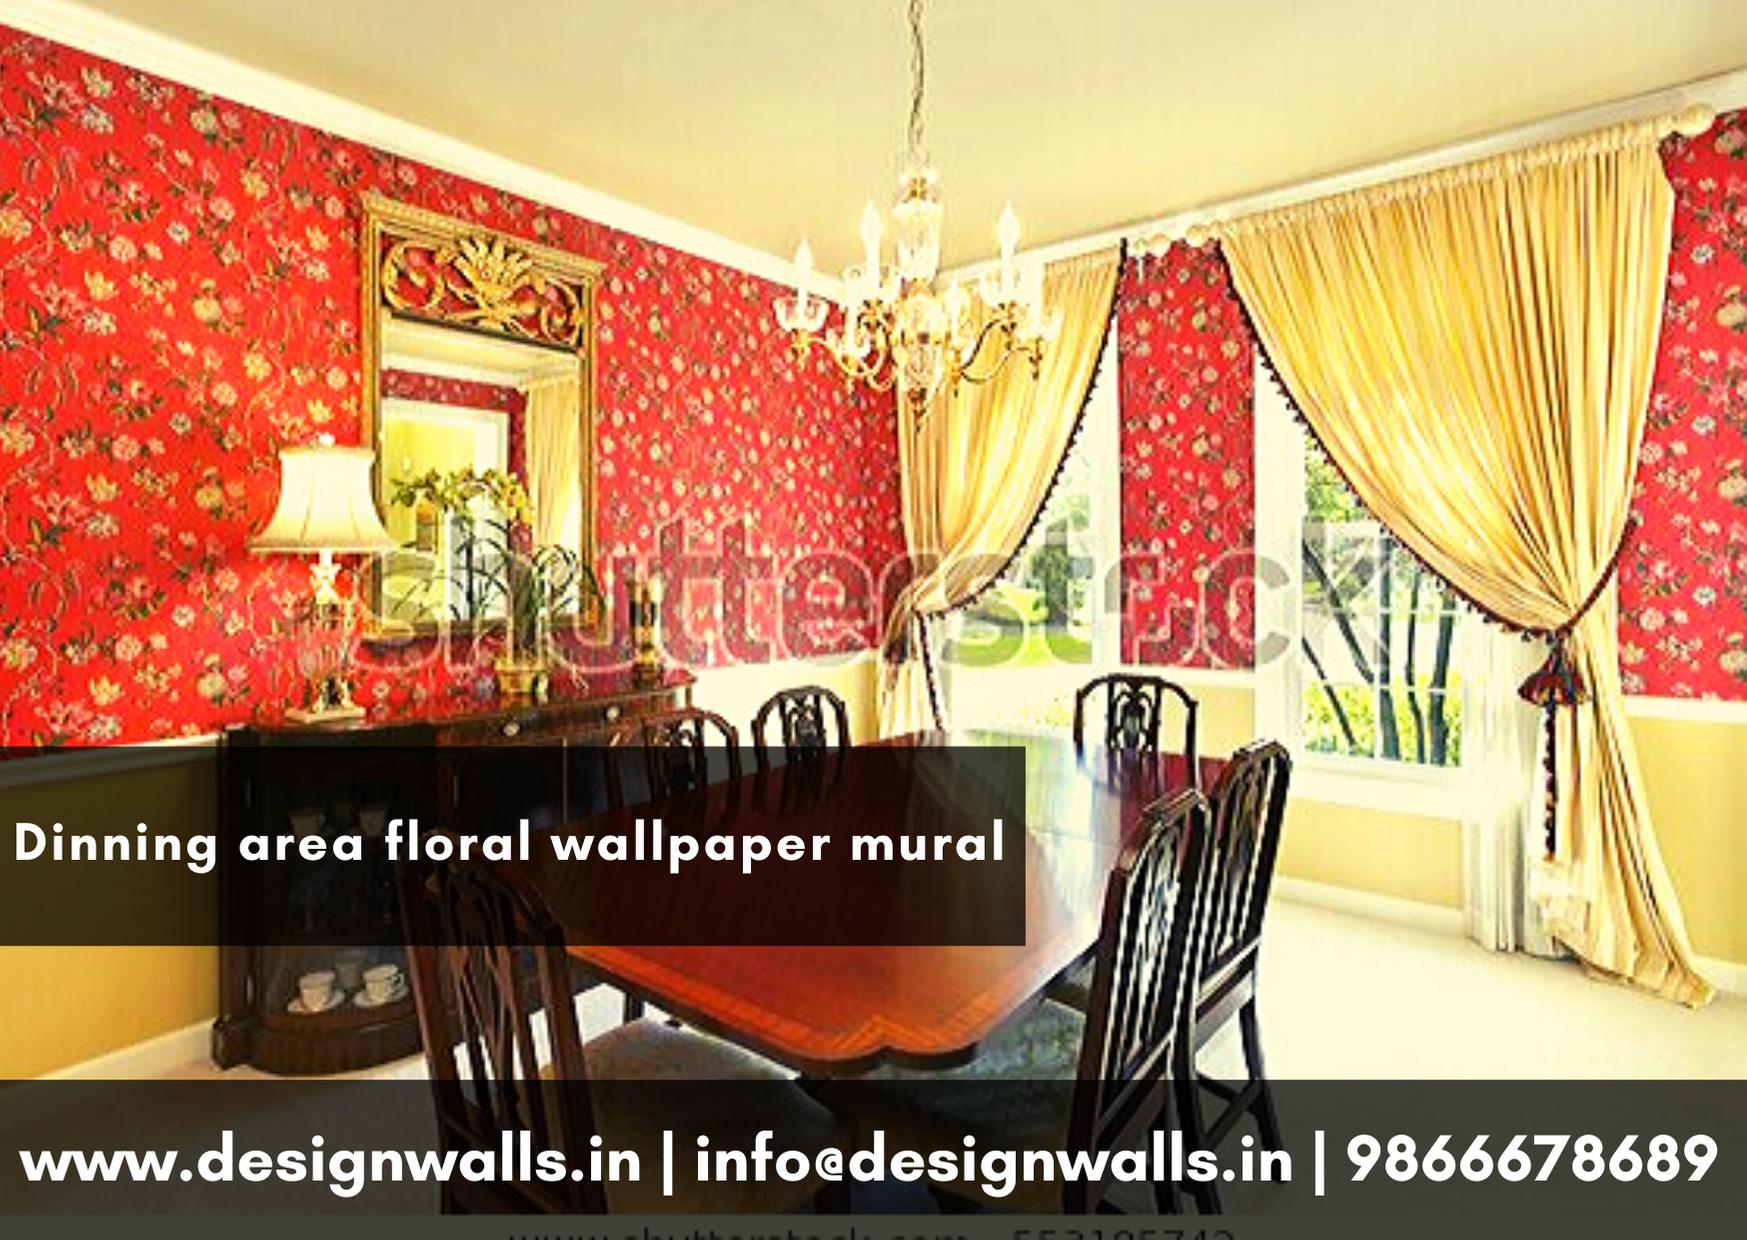 Design Walls The Wallpaper Company Floral Big Flower Wallp